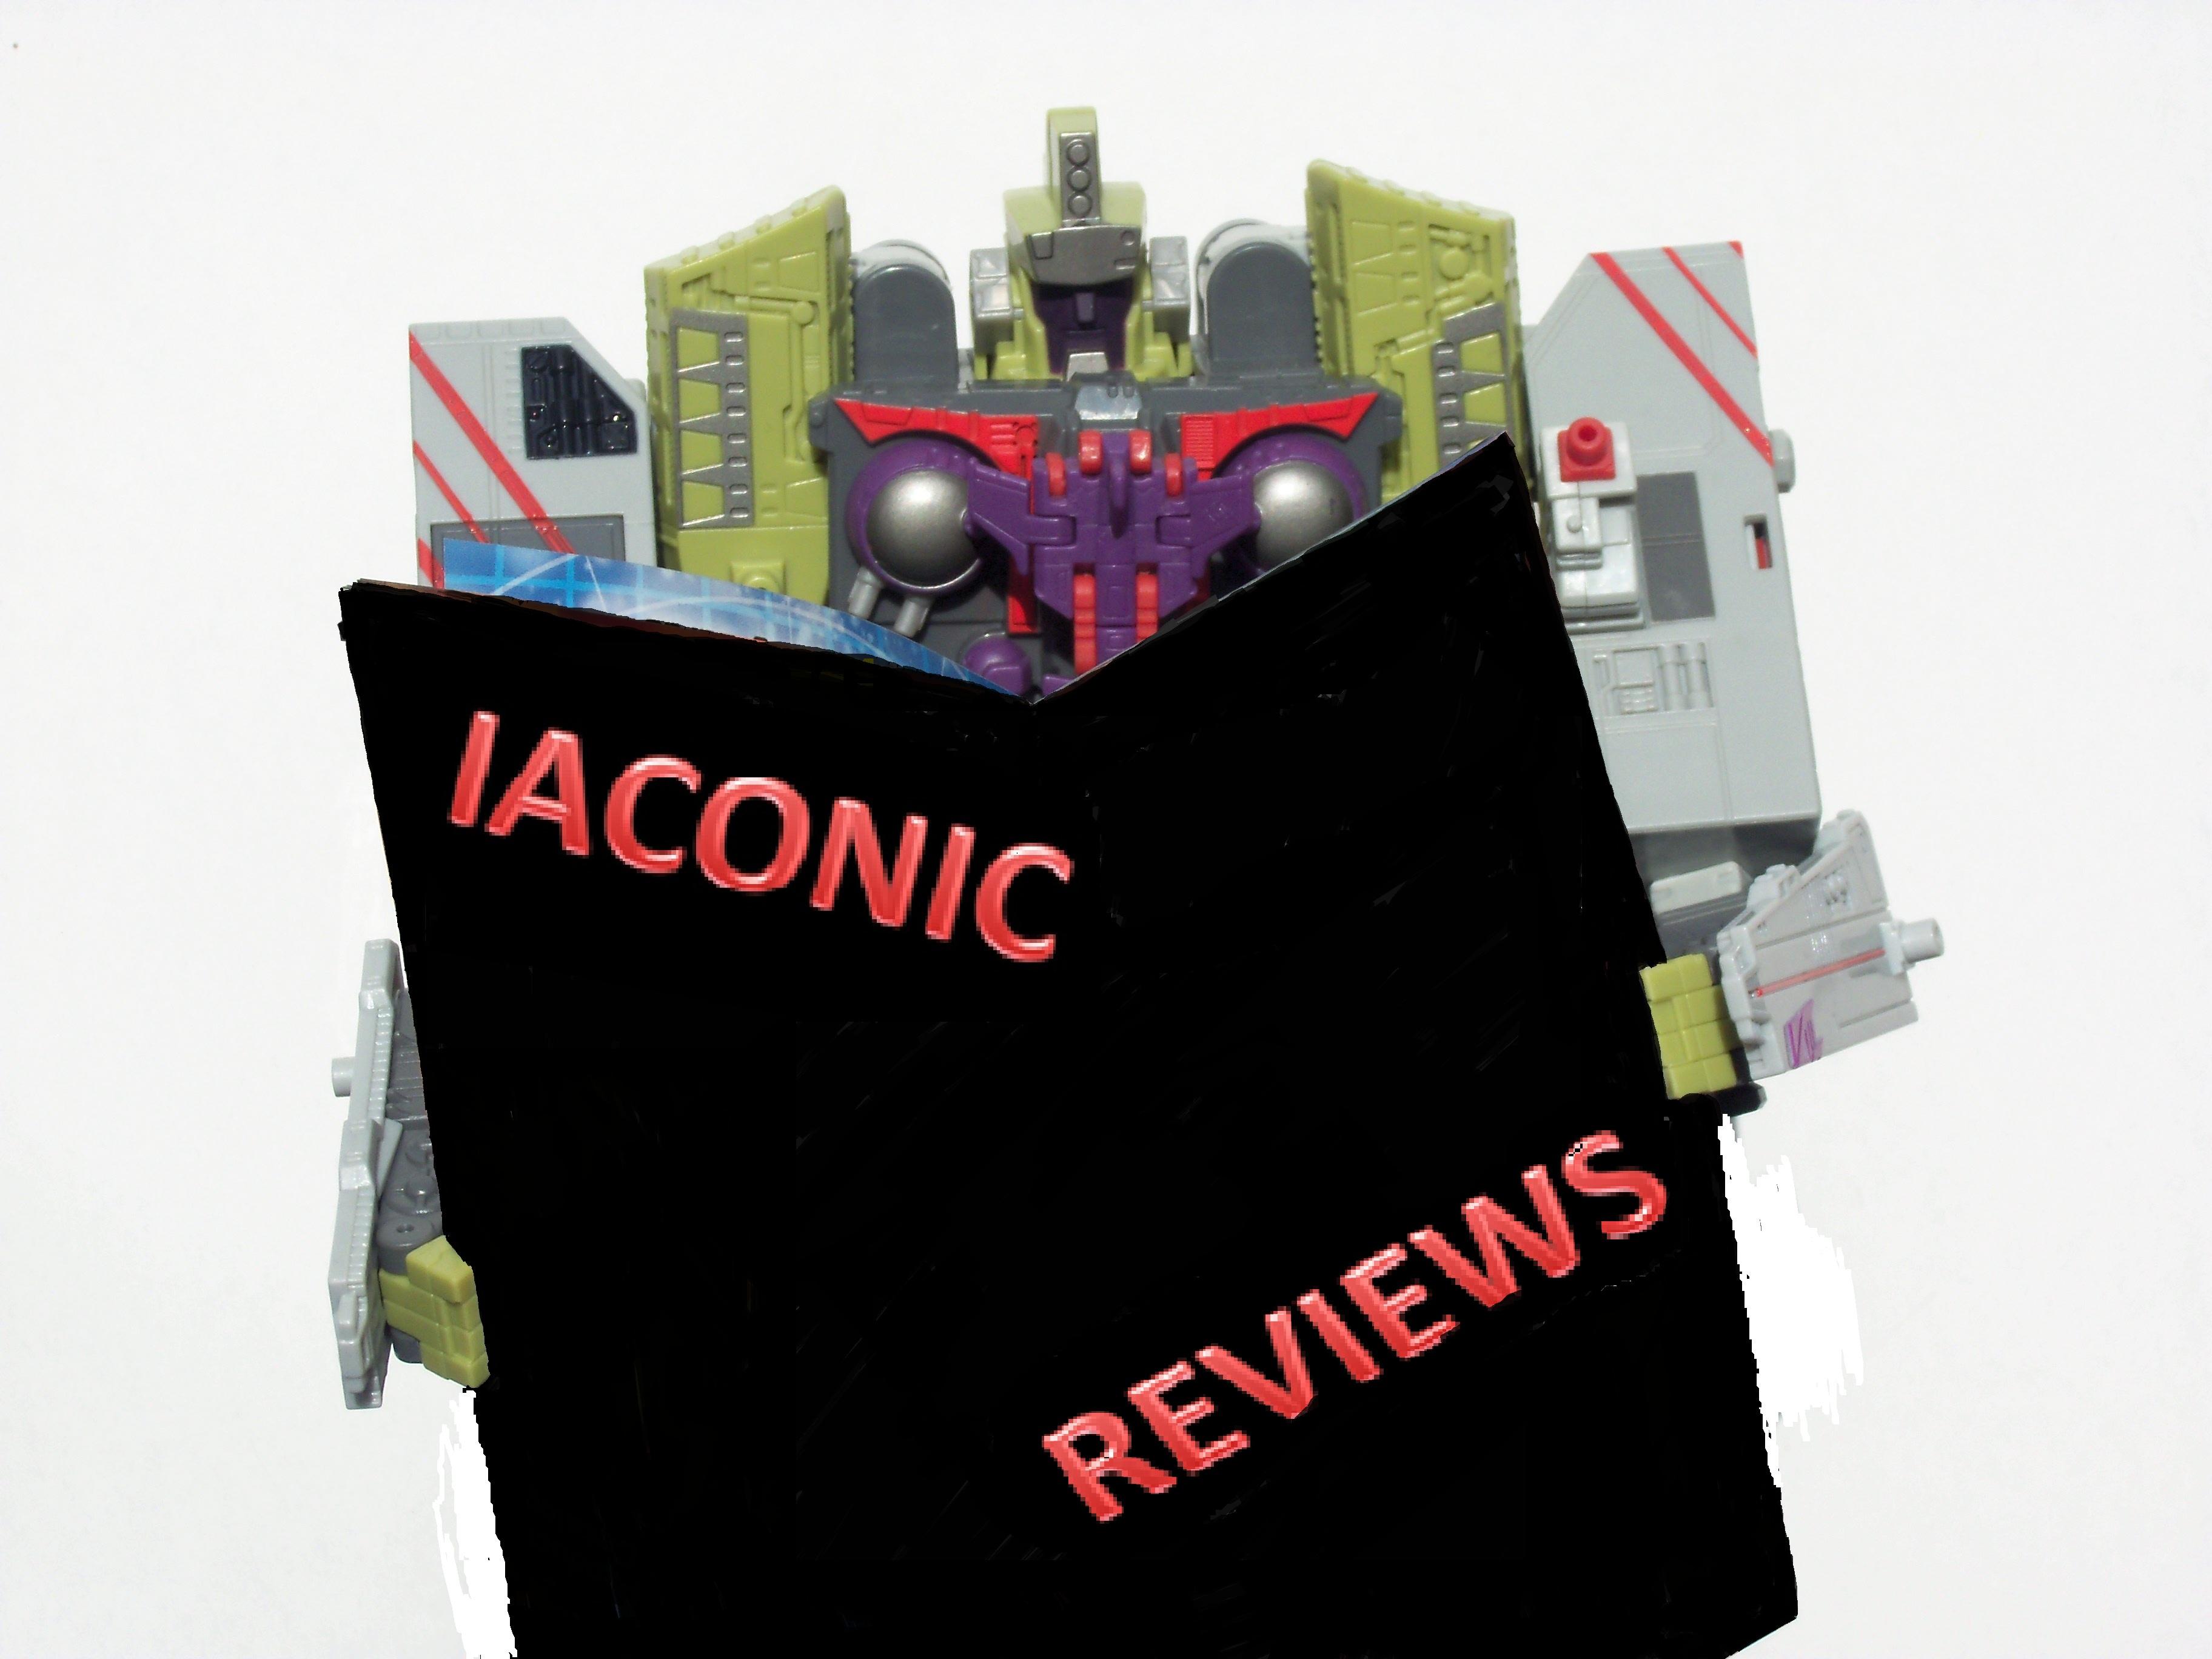 Iaconic Reviews